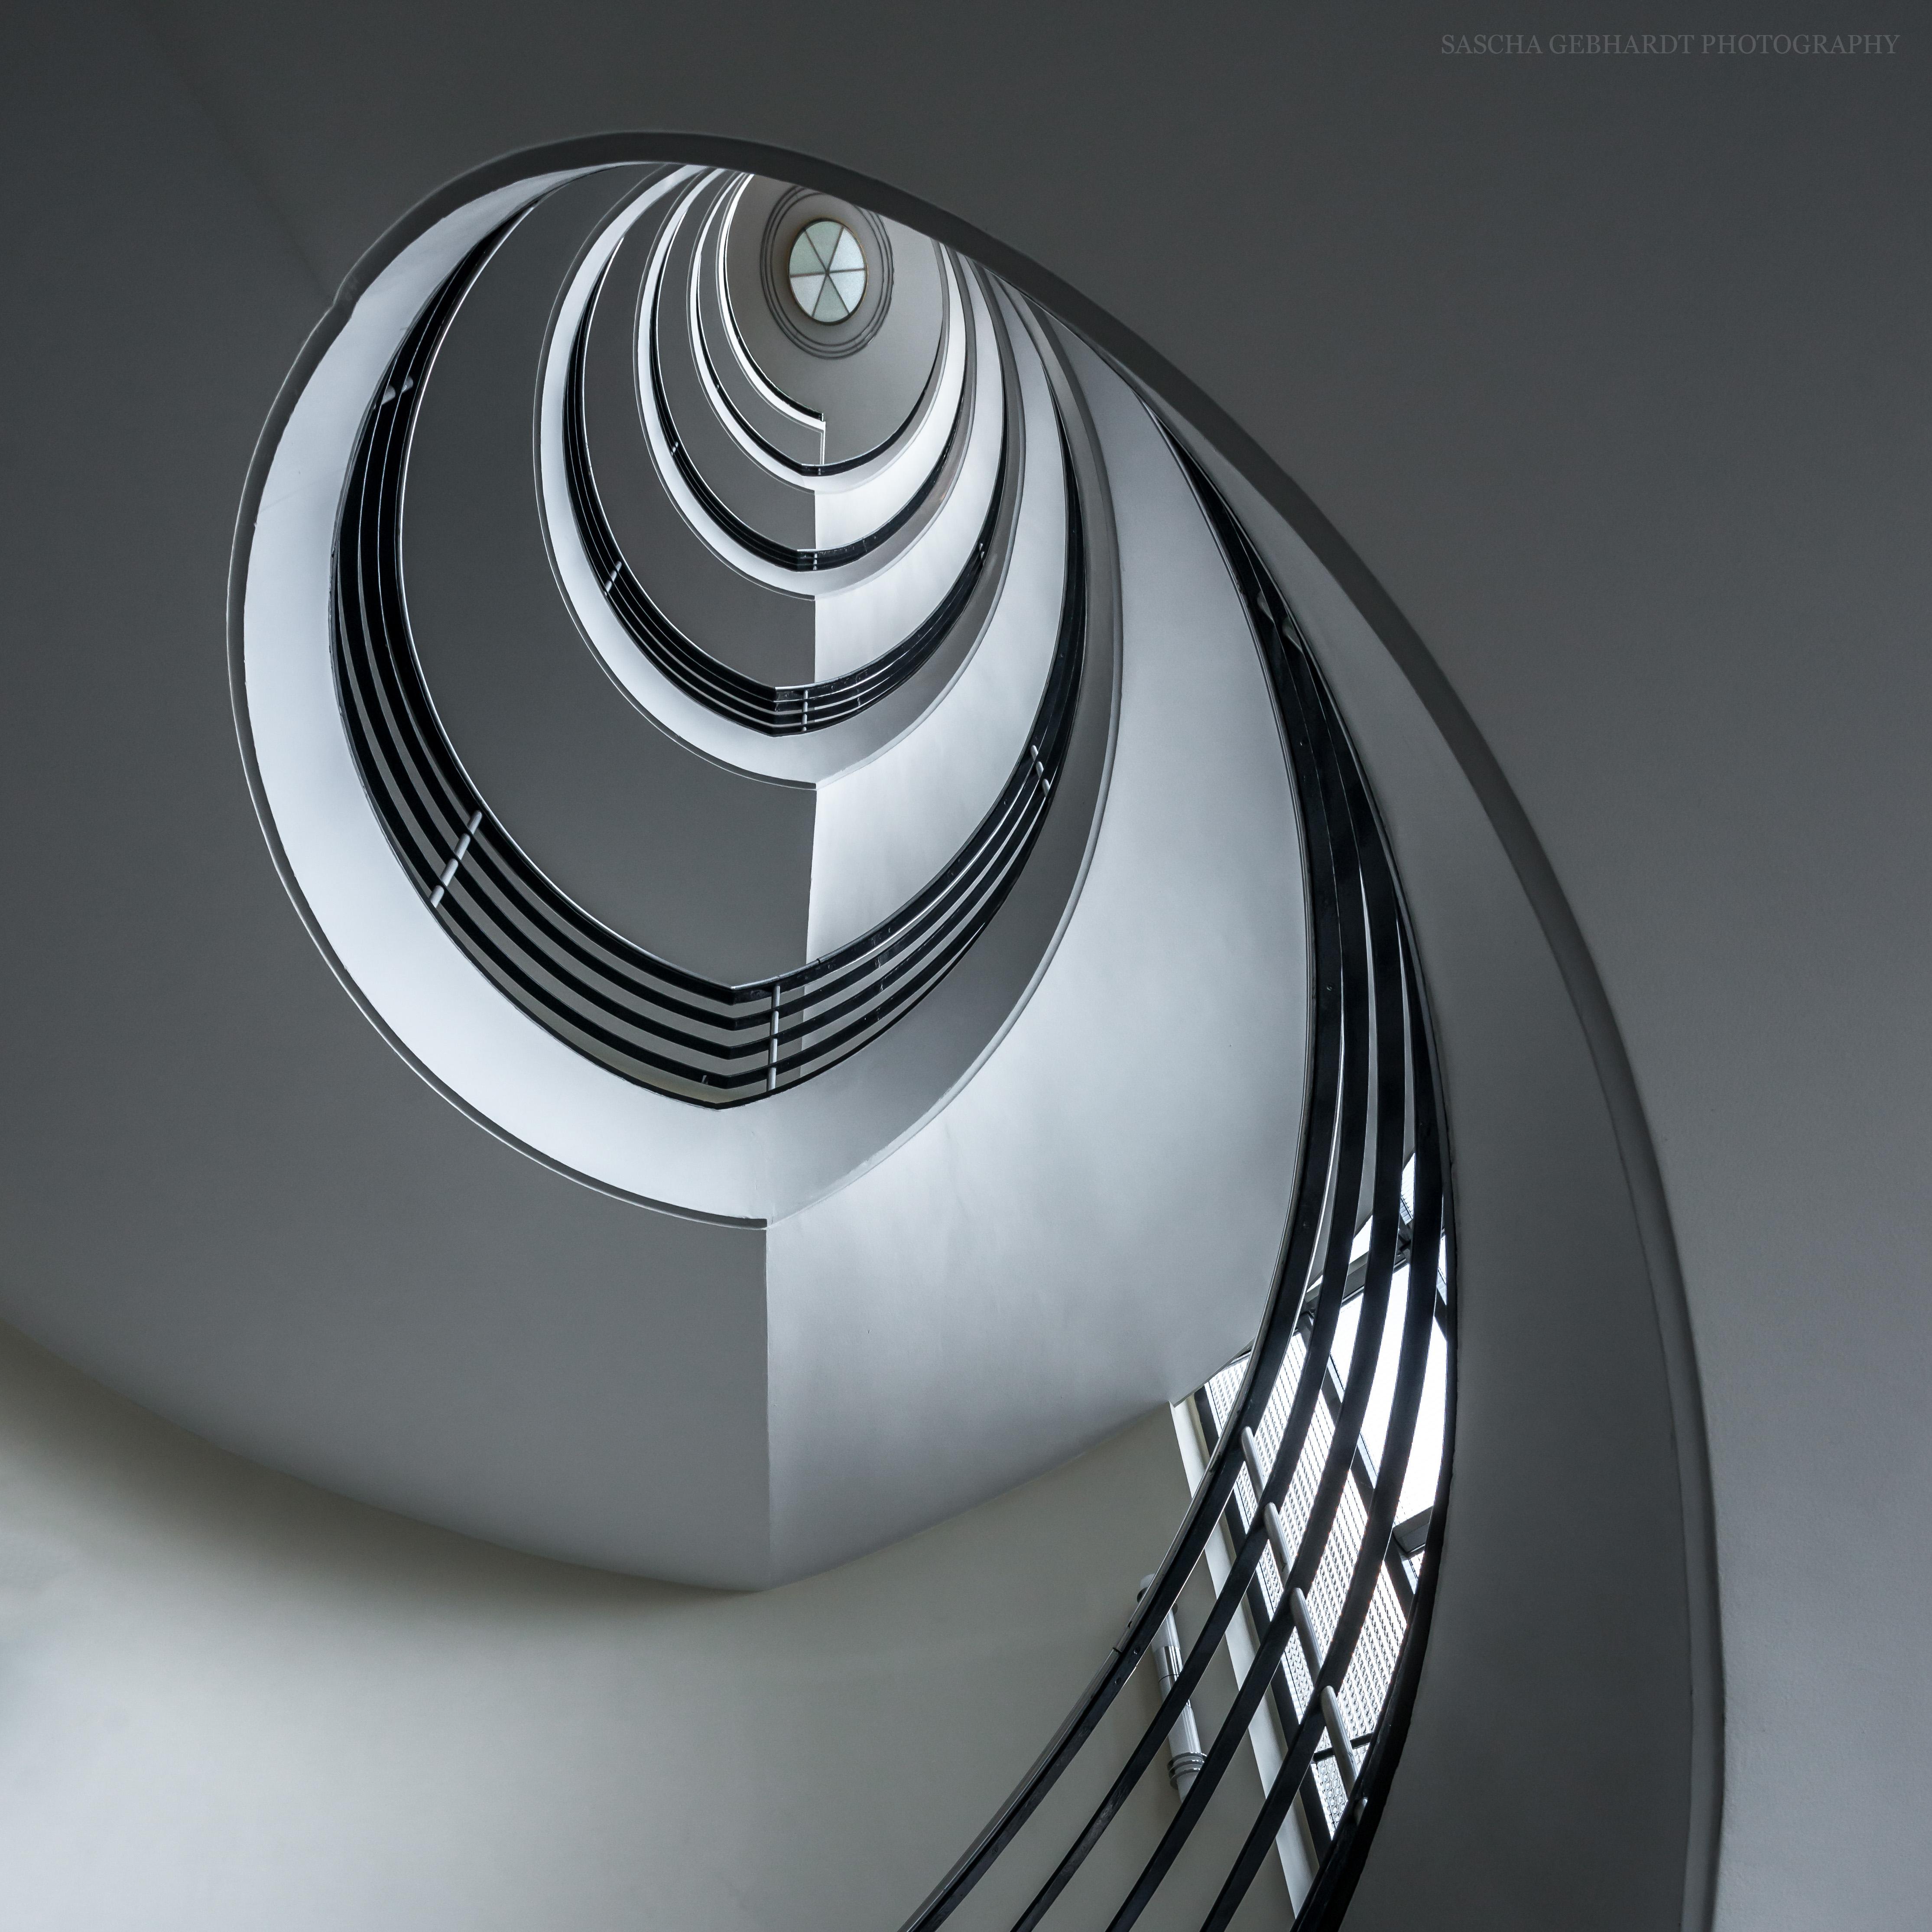 Stairs of Berlin